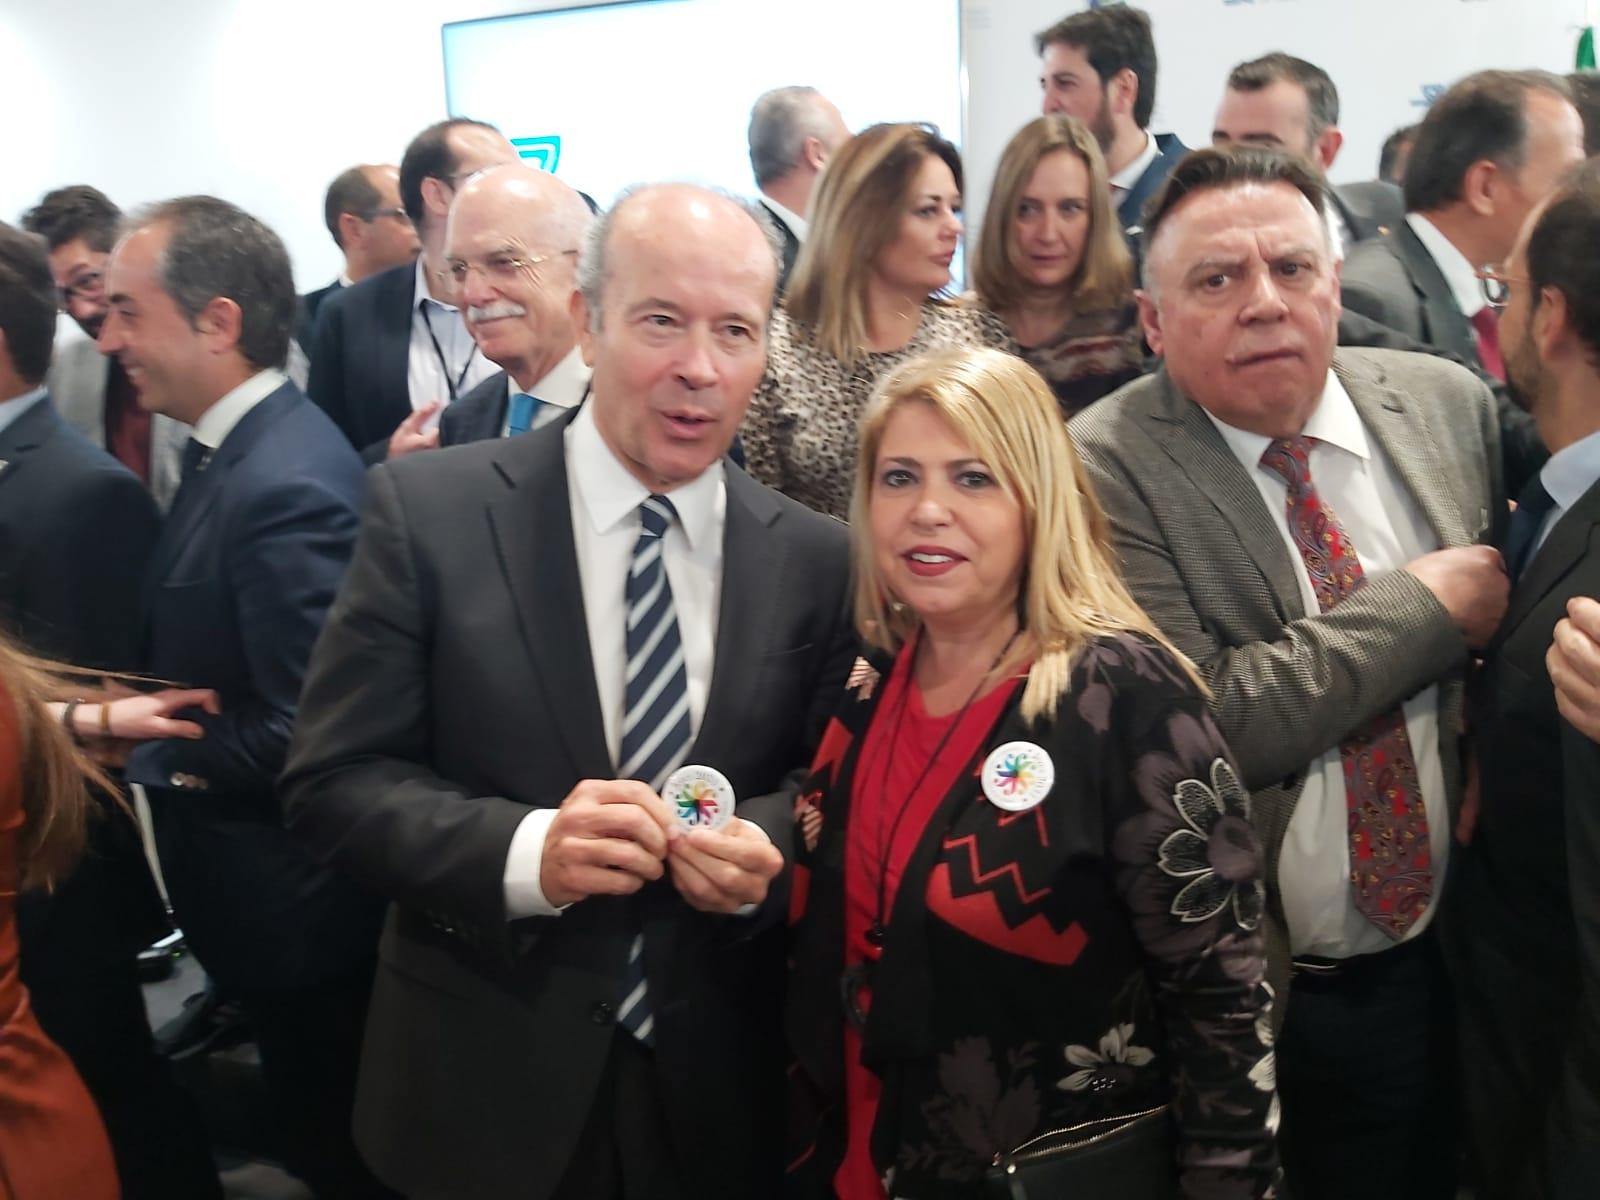 La alcaldesa en Fitur